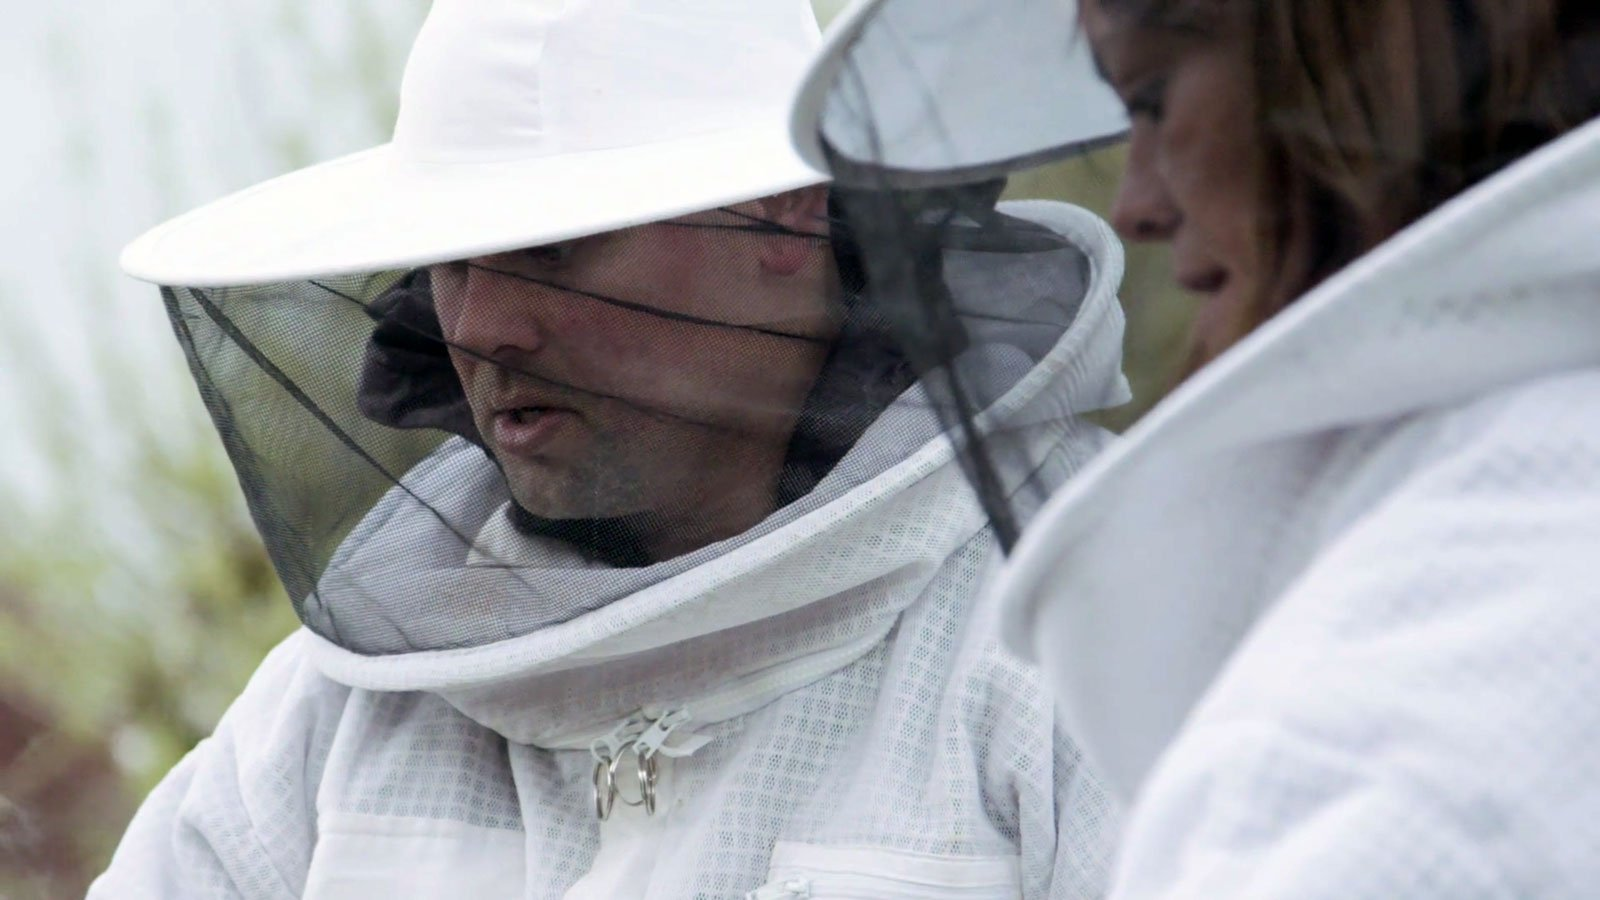 alan turanski wearing bee equipment